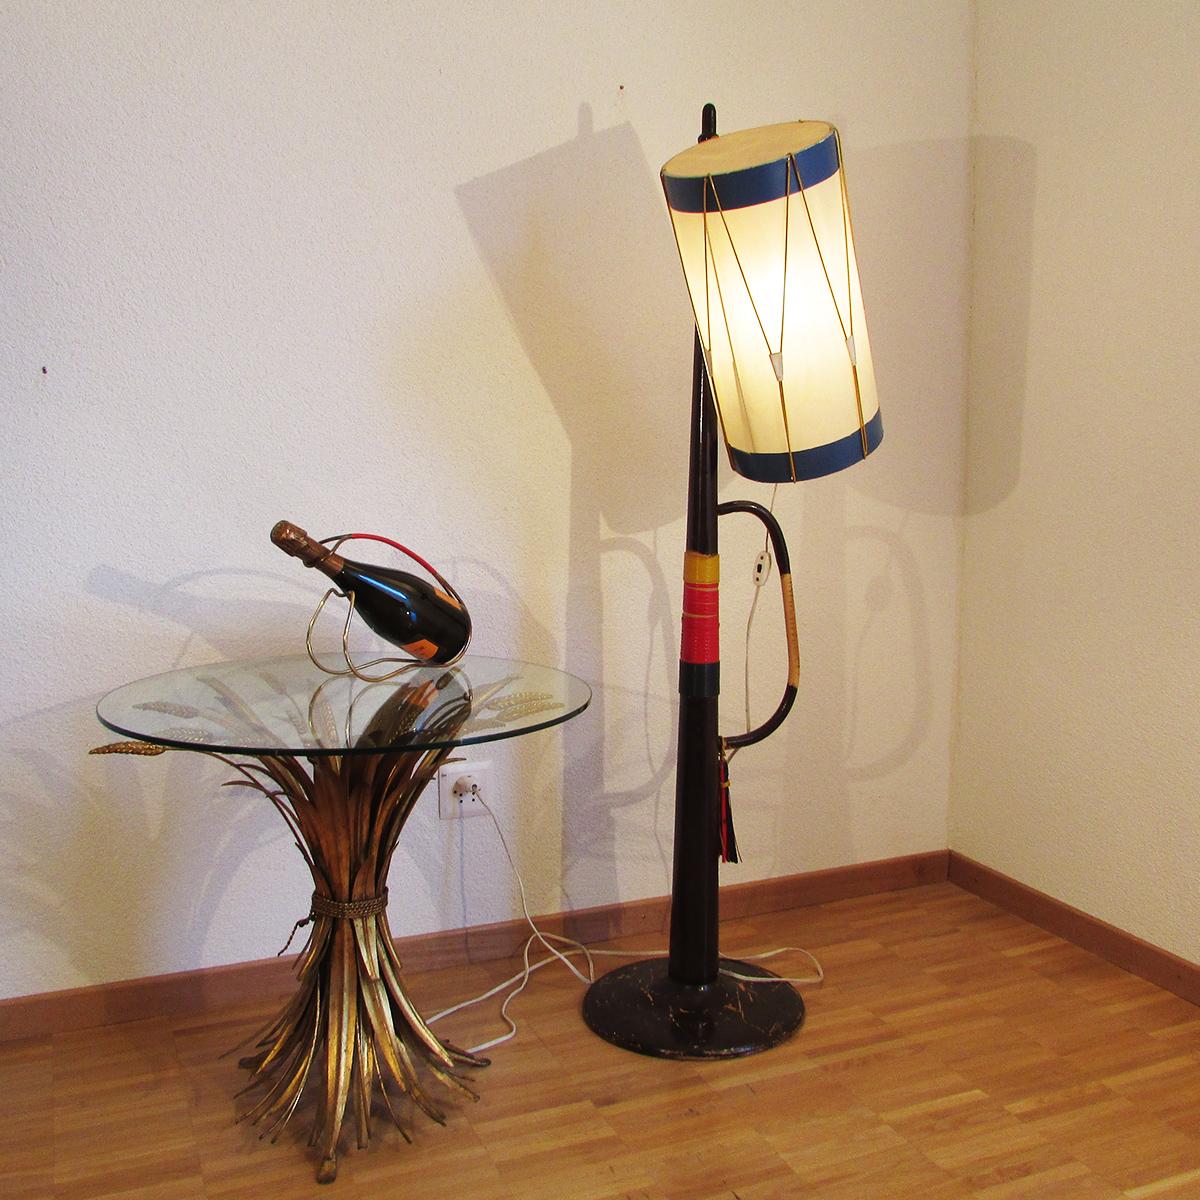 floor-lamp-jazz-band-vintage